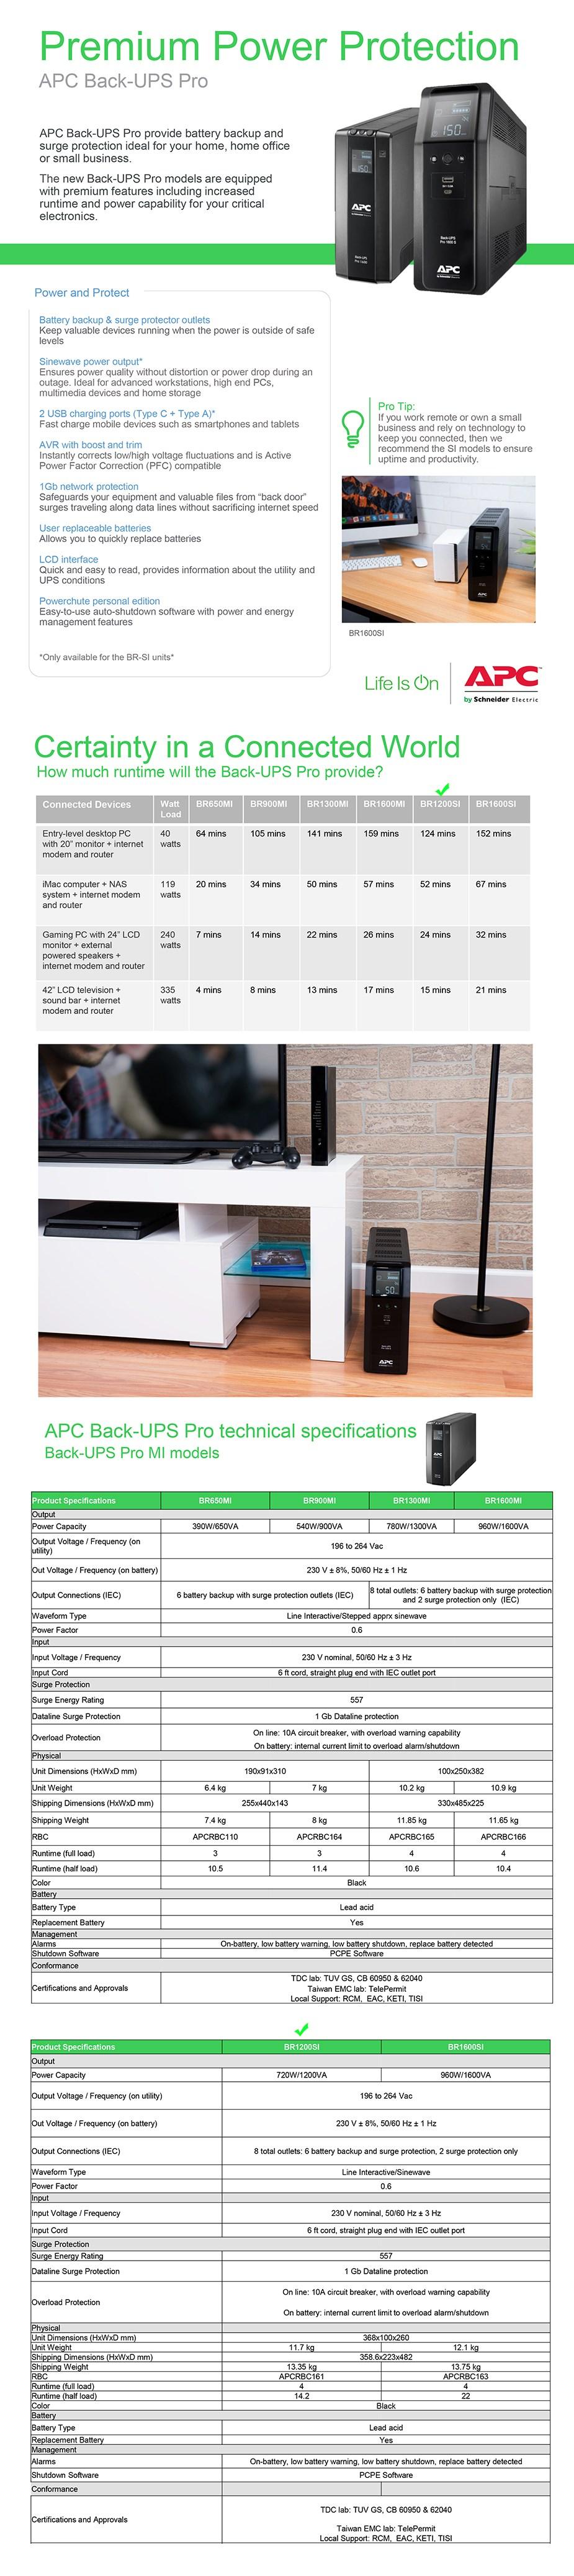 apc-br1200si-back-ups-pro-br-1200va720w-sinewave-line-interactive-ups-ac33522-4.jpg